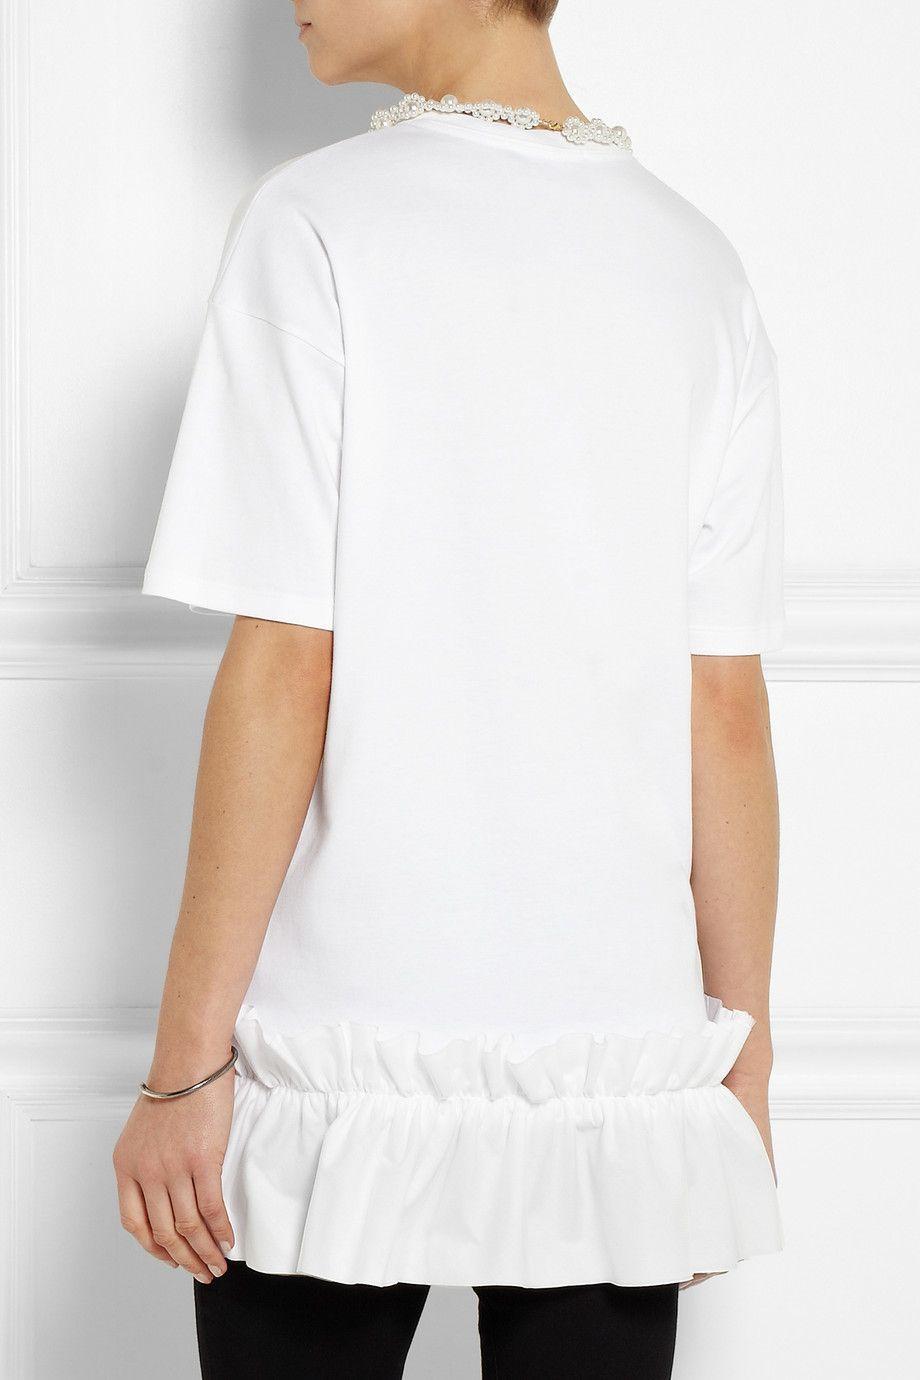 Simone Rocha Faux pearl-embellished cotton-jersey T-shirt NET-A-PORTER.COM